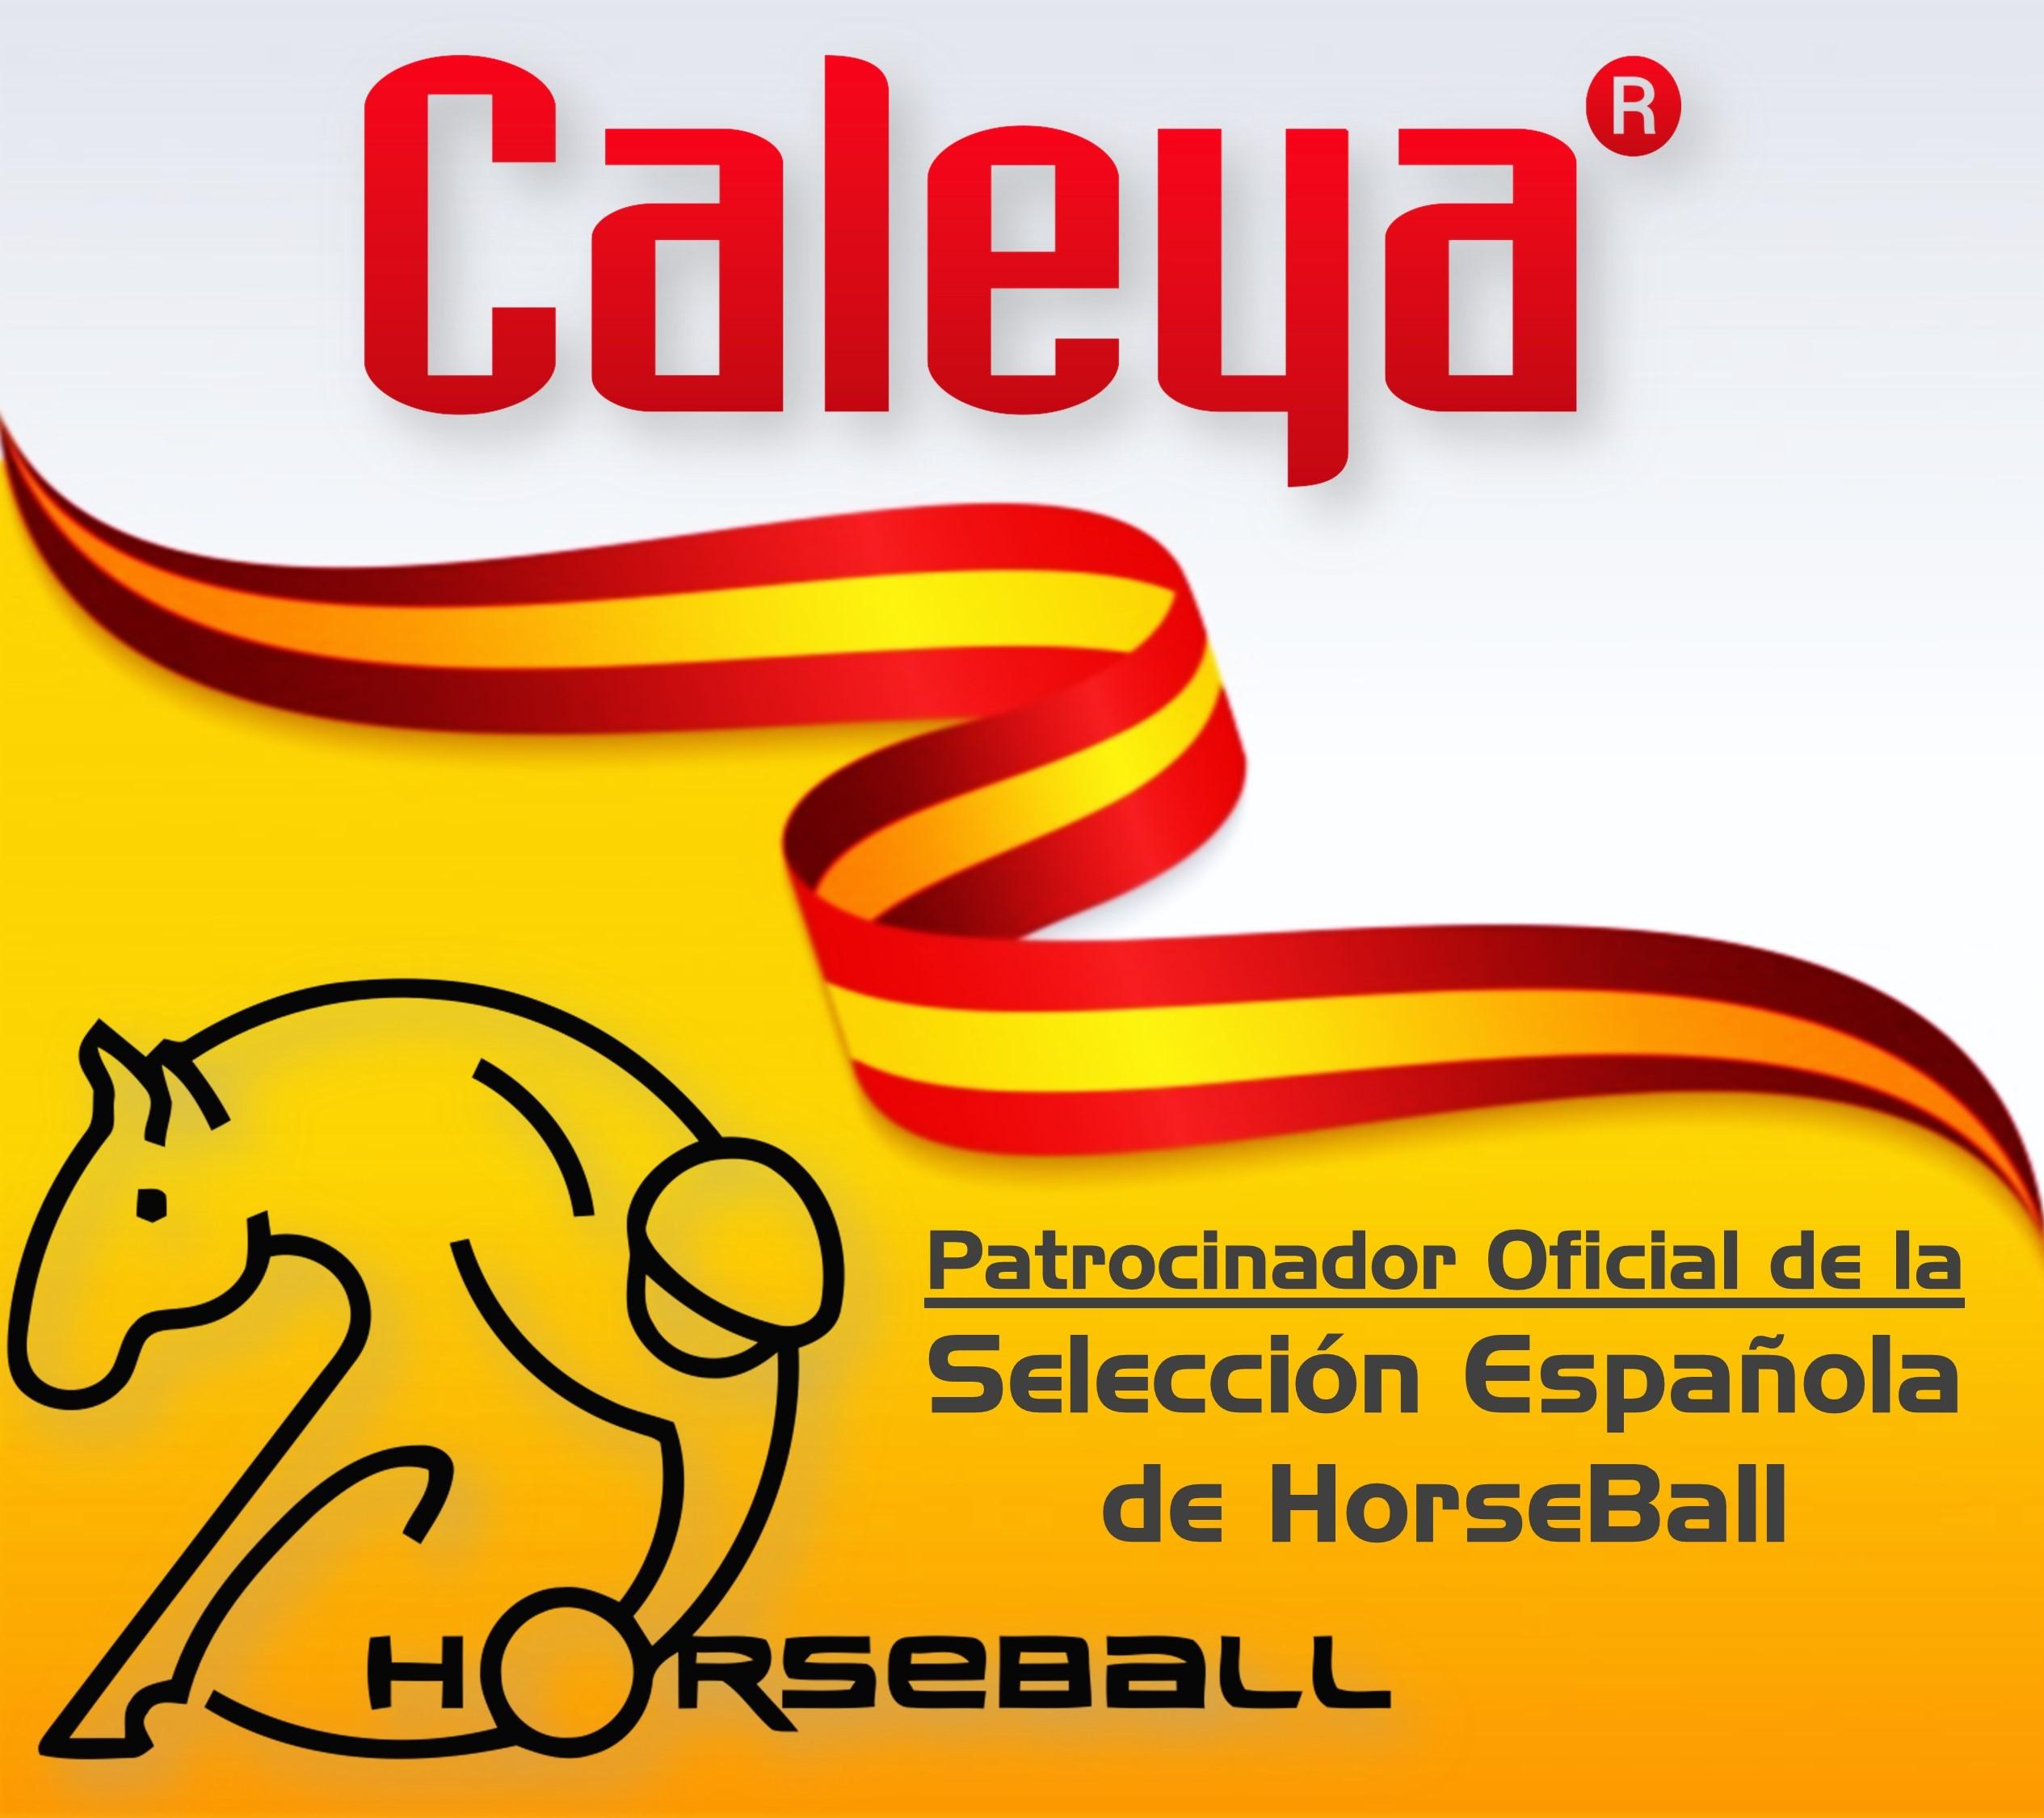 Caleya Patrocinador Oficial de la Selección Española de Horseball